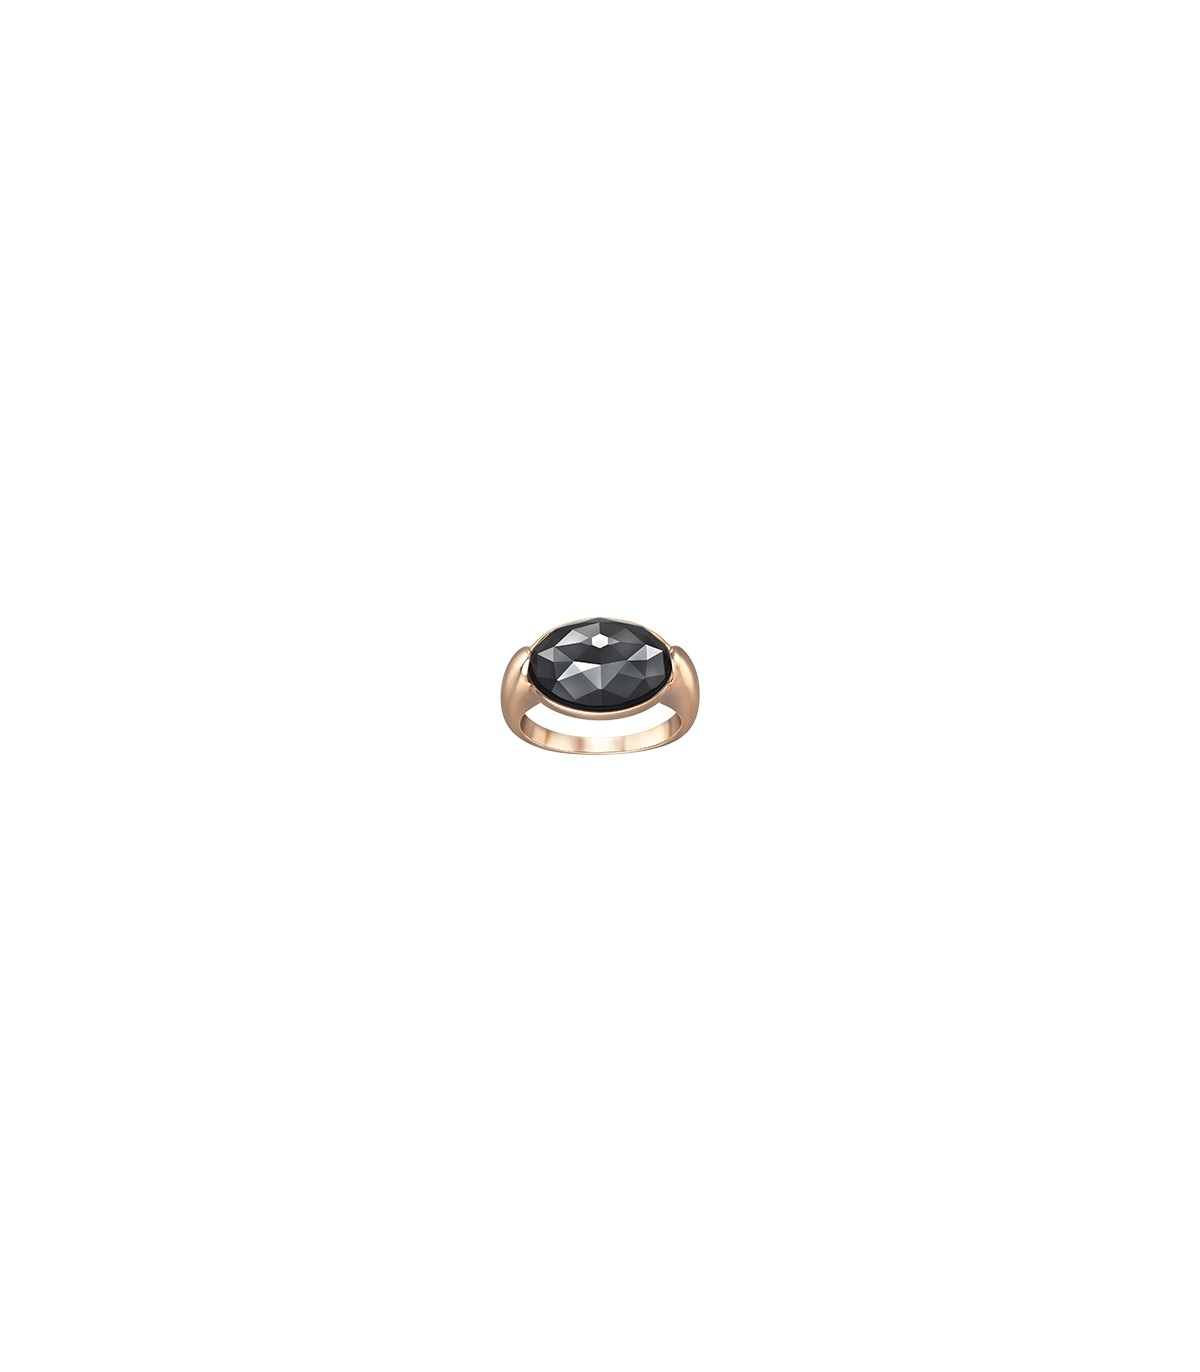 Swarovski Jewellery vanilla jet hematite ring 60 - 5025214 ab91d0eb3fee